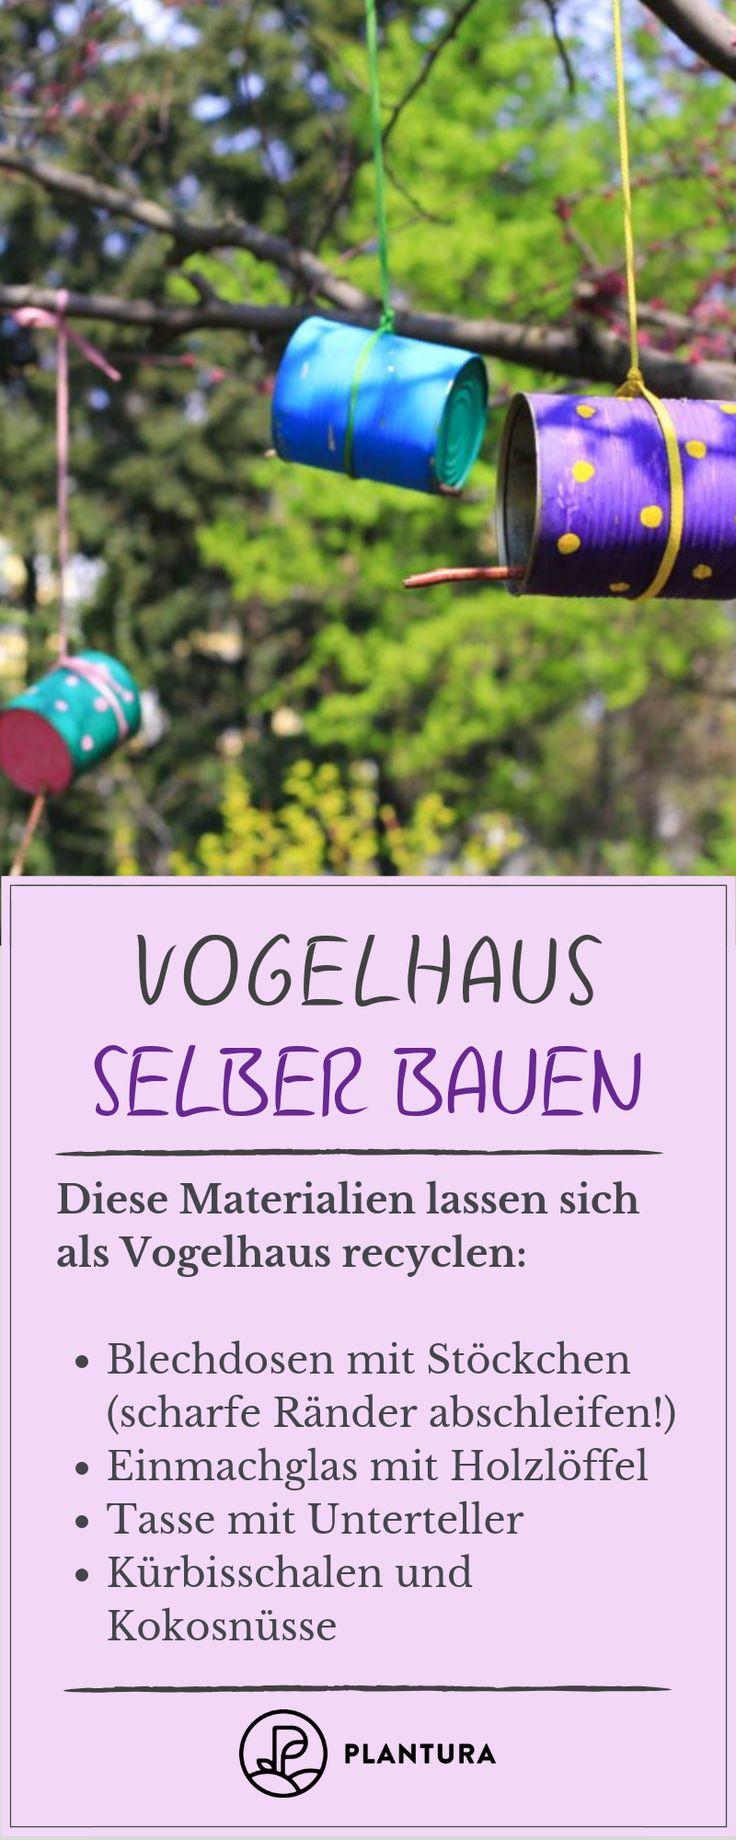 Vogelfutterhaus selber bauen: Anleitung, Ideen & Voraussetzungen